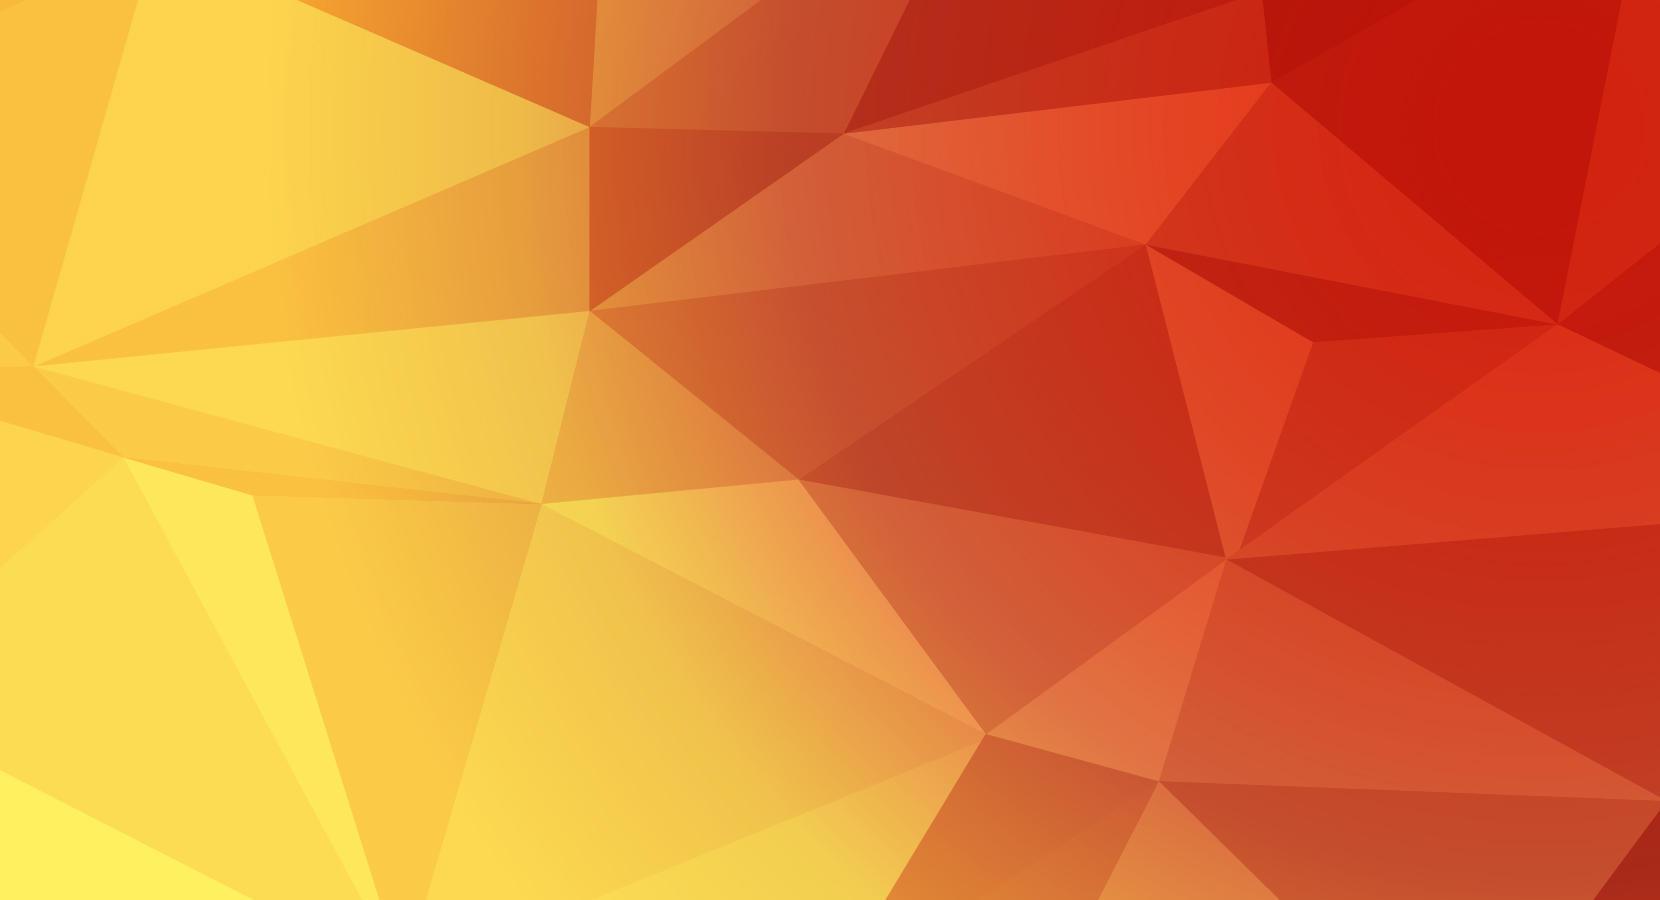 origami free wallpaper - photo #25